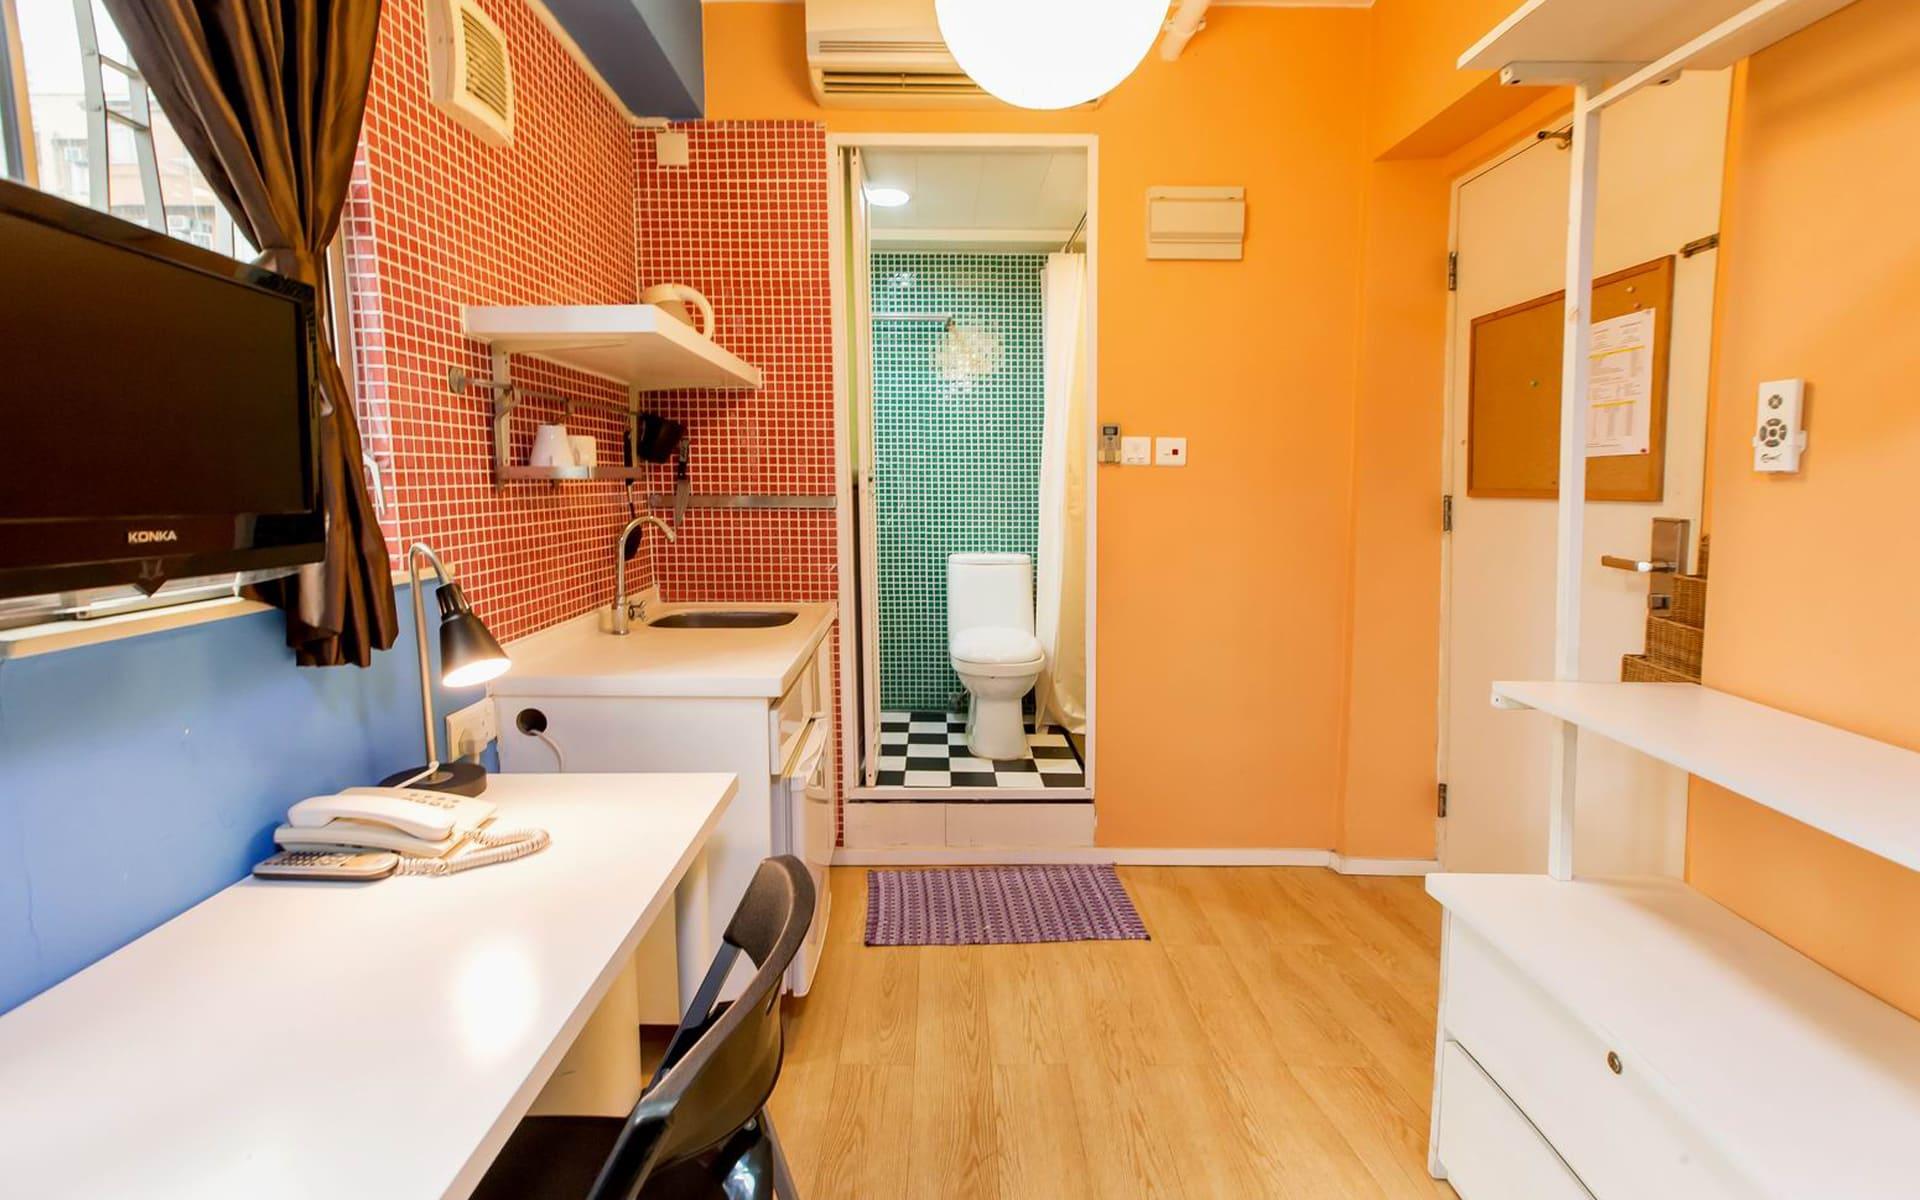 hk_service_apartment_17576447011580801987.jpg